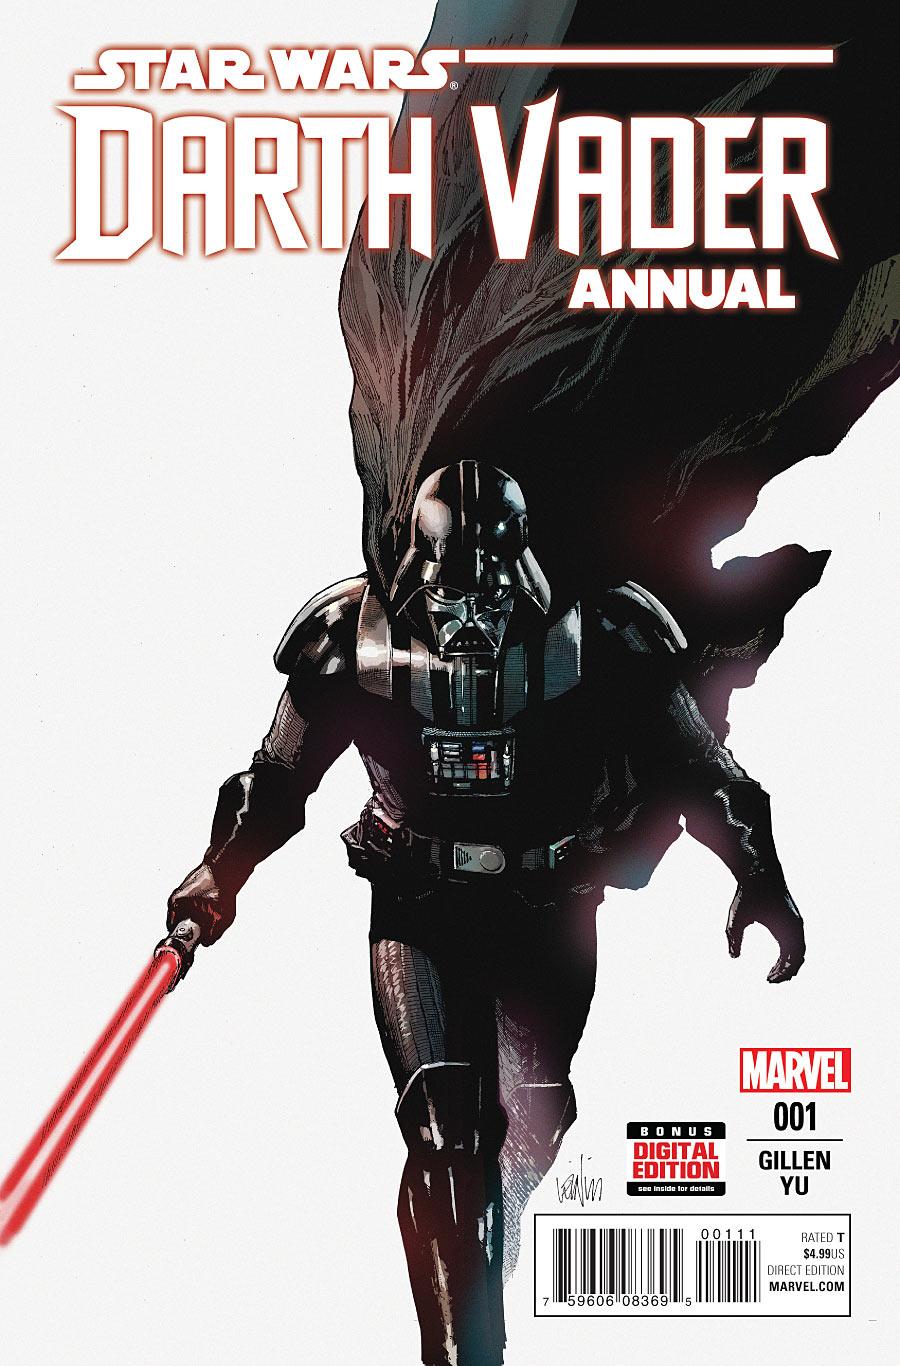 Star Wars: Darth Vader Annual #1